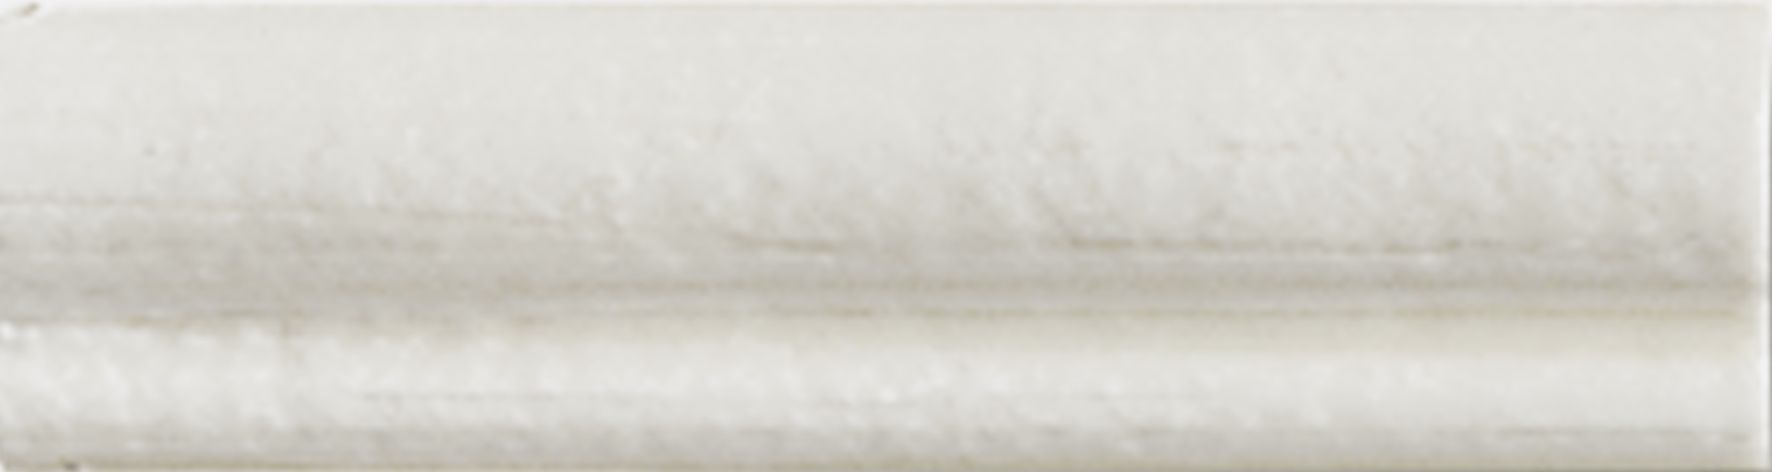 Porte Moldura Chic Neutro 4x15 - Hansas Plaadimaailm